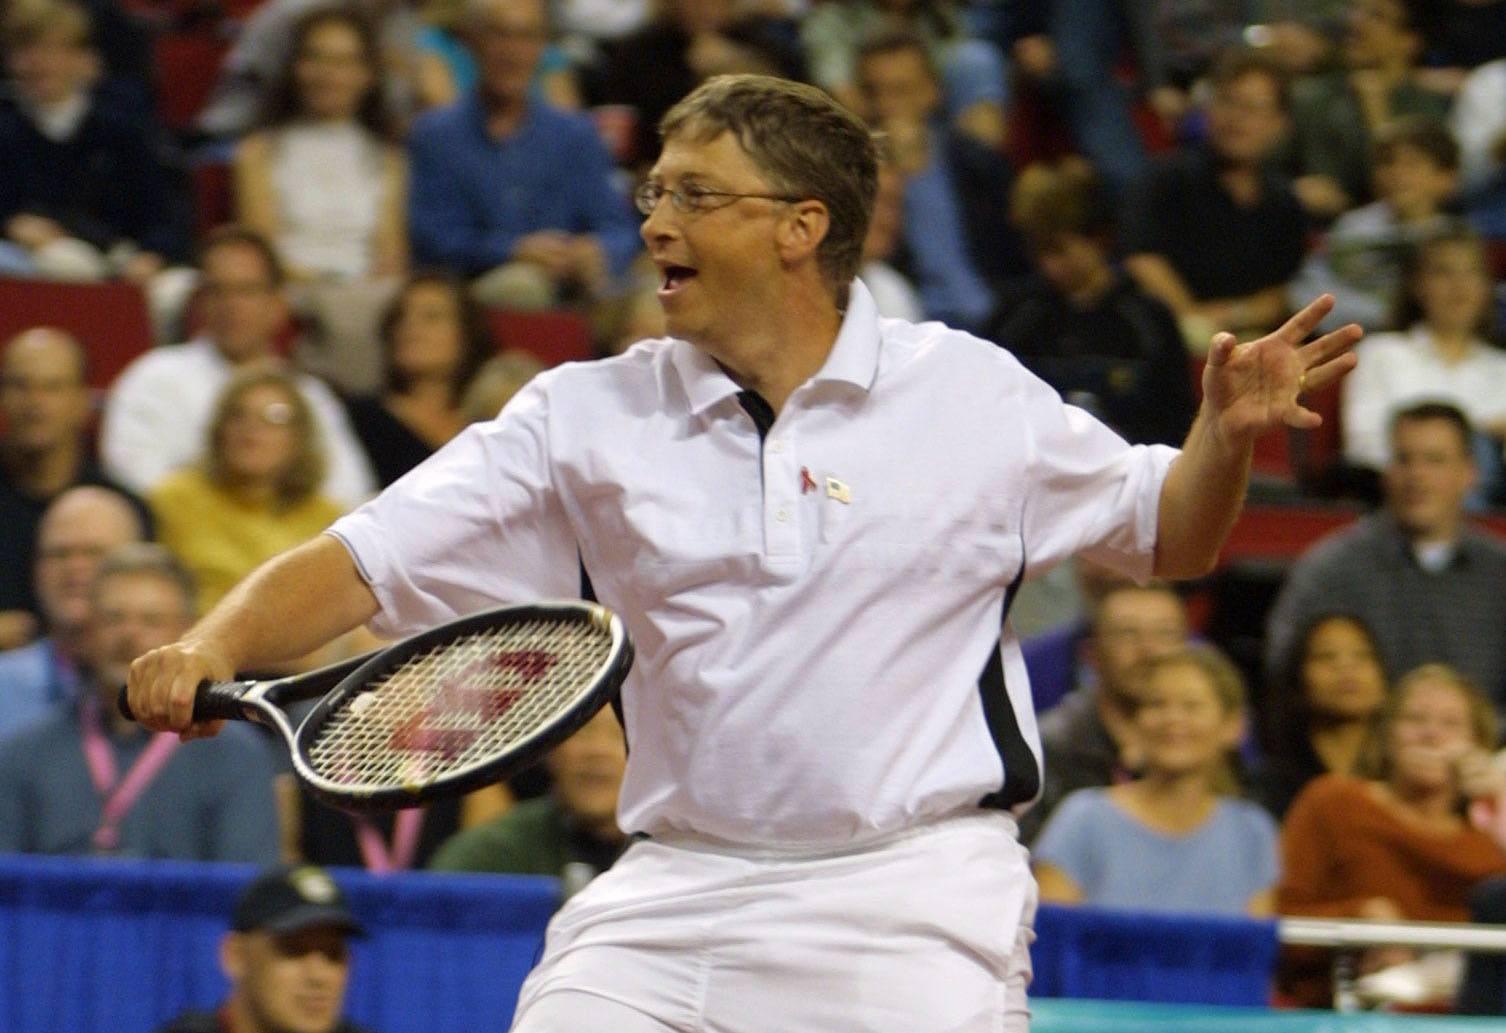 Bill Gates playing tennis